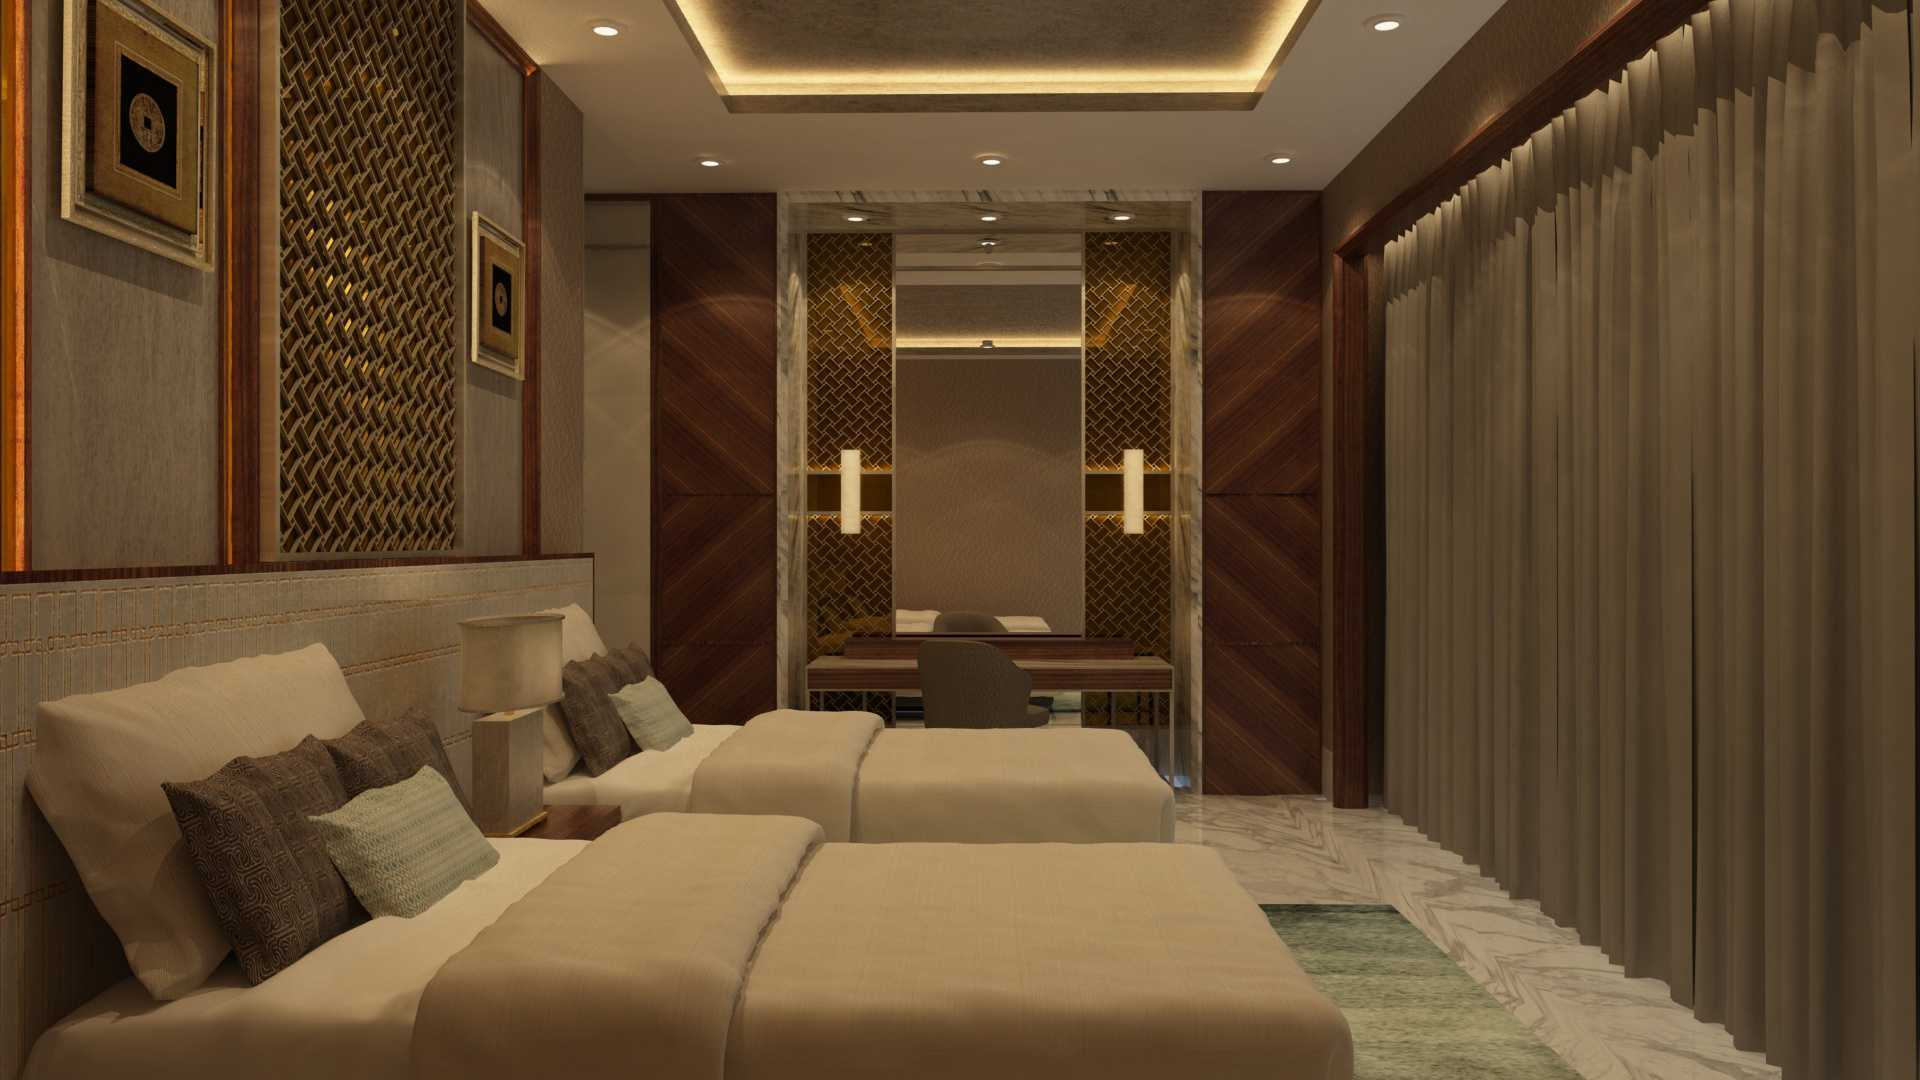 Vin•da•te Mayang Permai Residence Ii - Residential Project (Artist Impression - Construction In Progress) Pantai Indah Kapuk - North Jakarta Pantai Indah Kapuk - North Jakarta 24-Alt-1 Kontemporer  17205